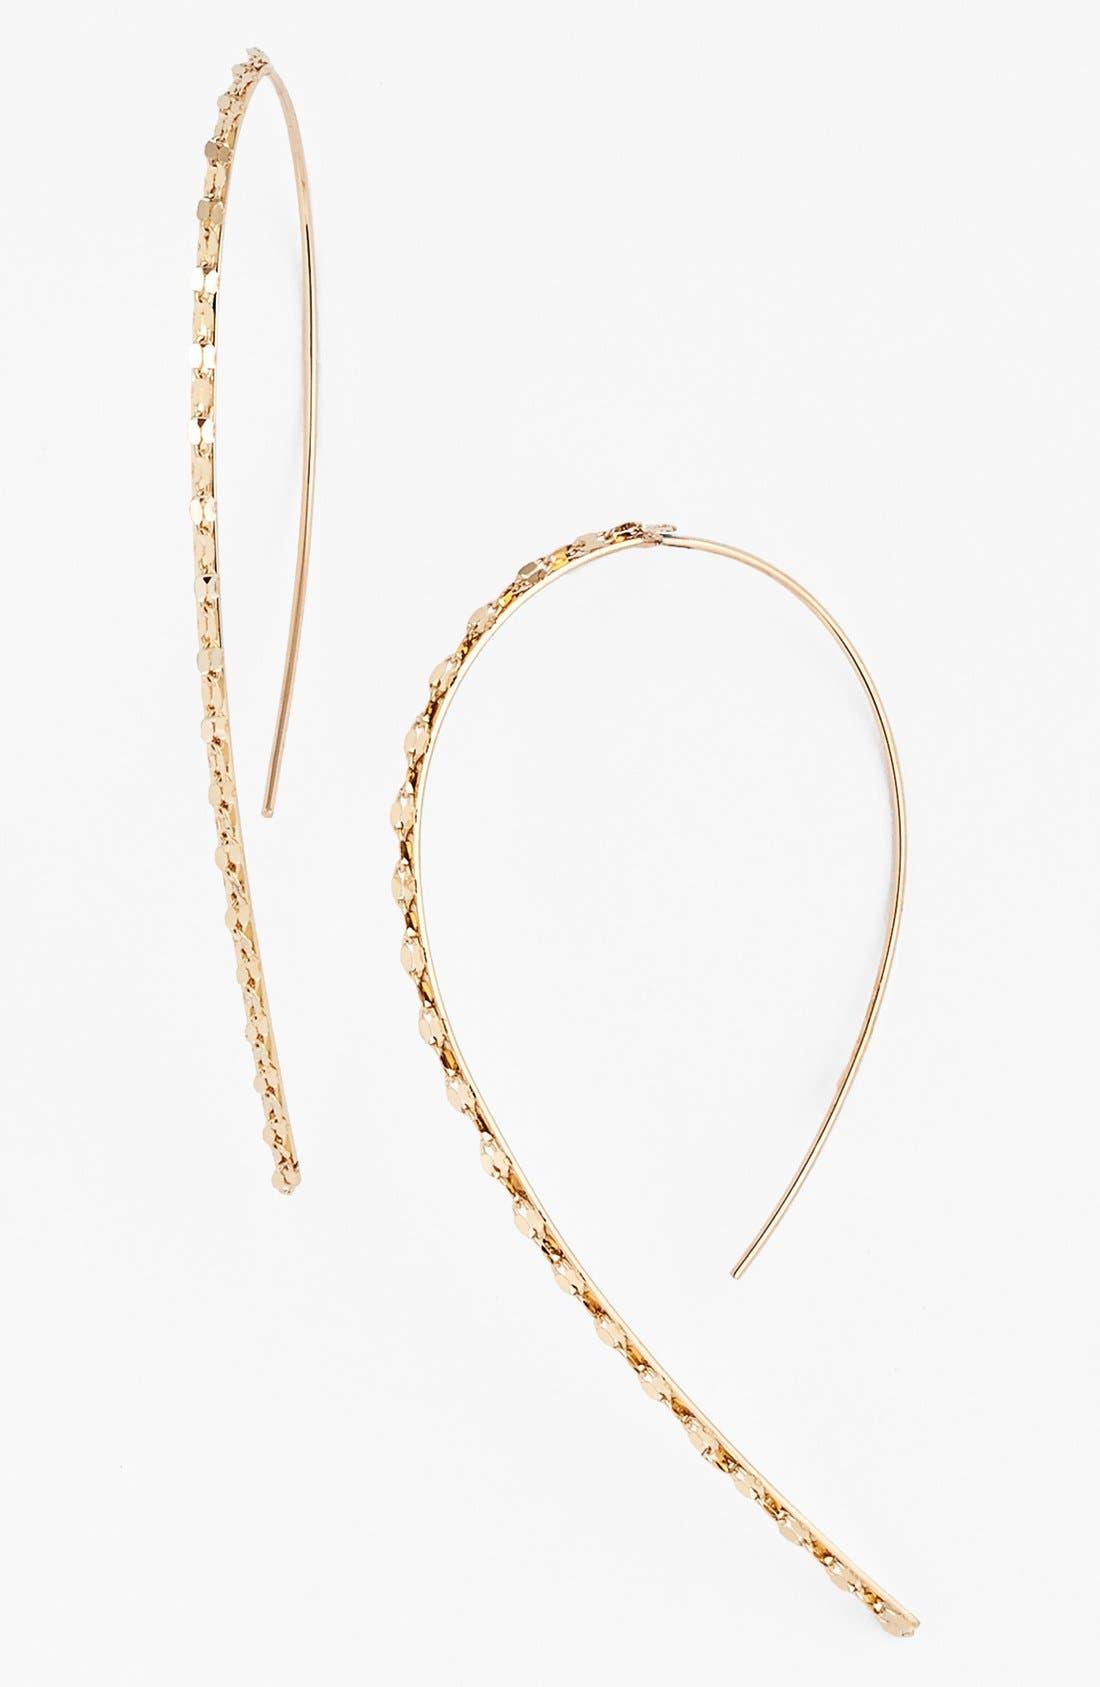 Alternate Image 1 Selected - Lana Jewelry 'Glam' Small Hooked-On Hoop Earrings